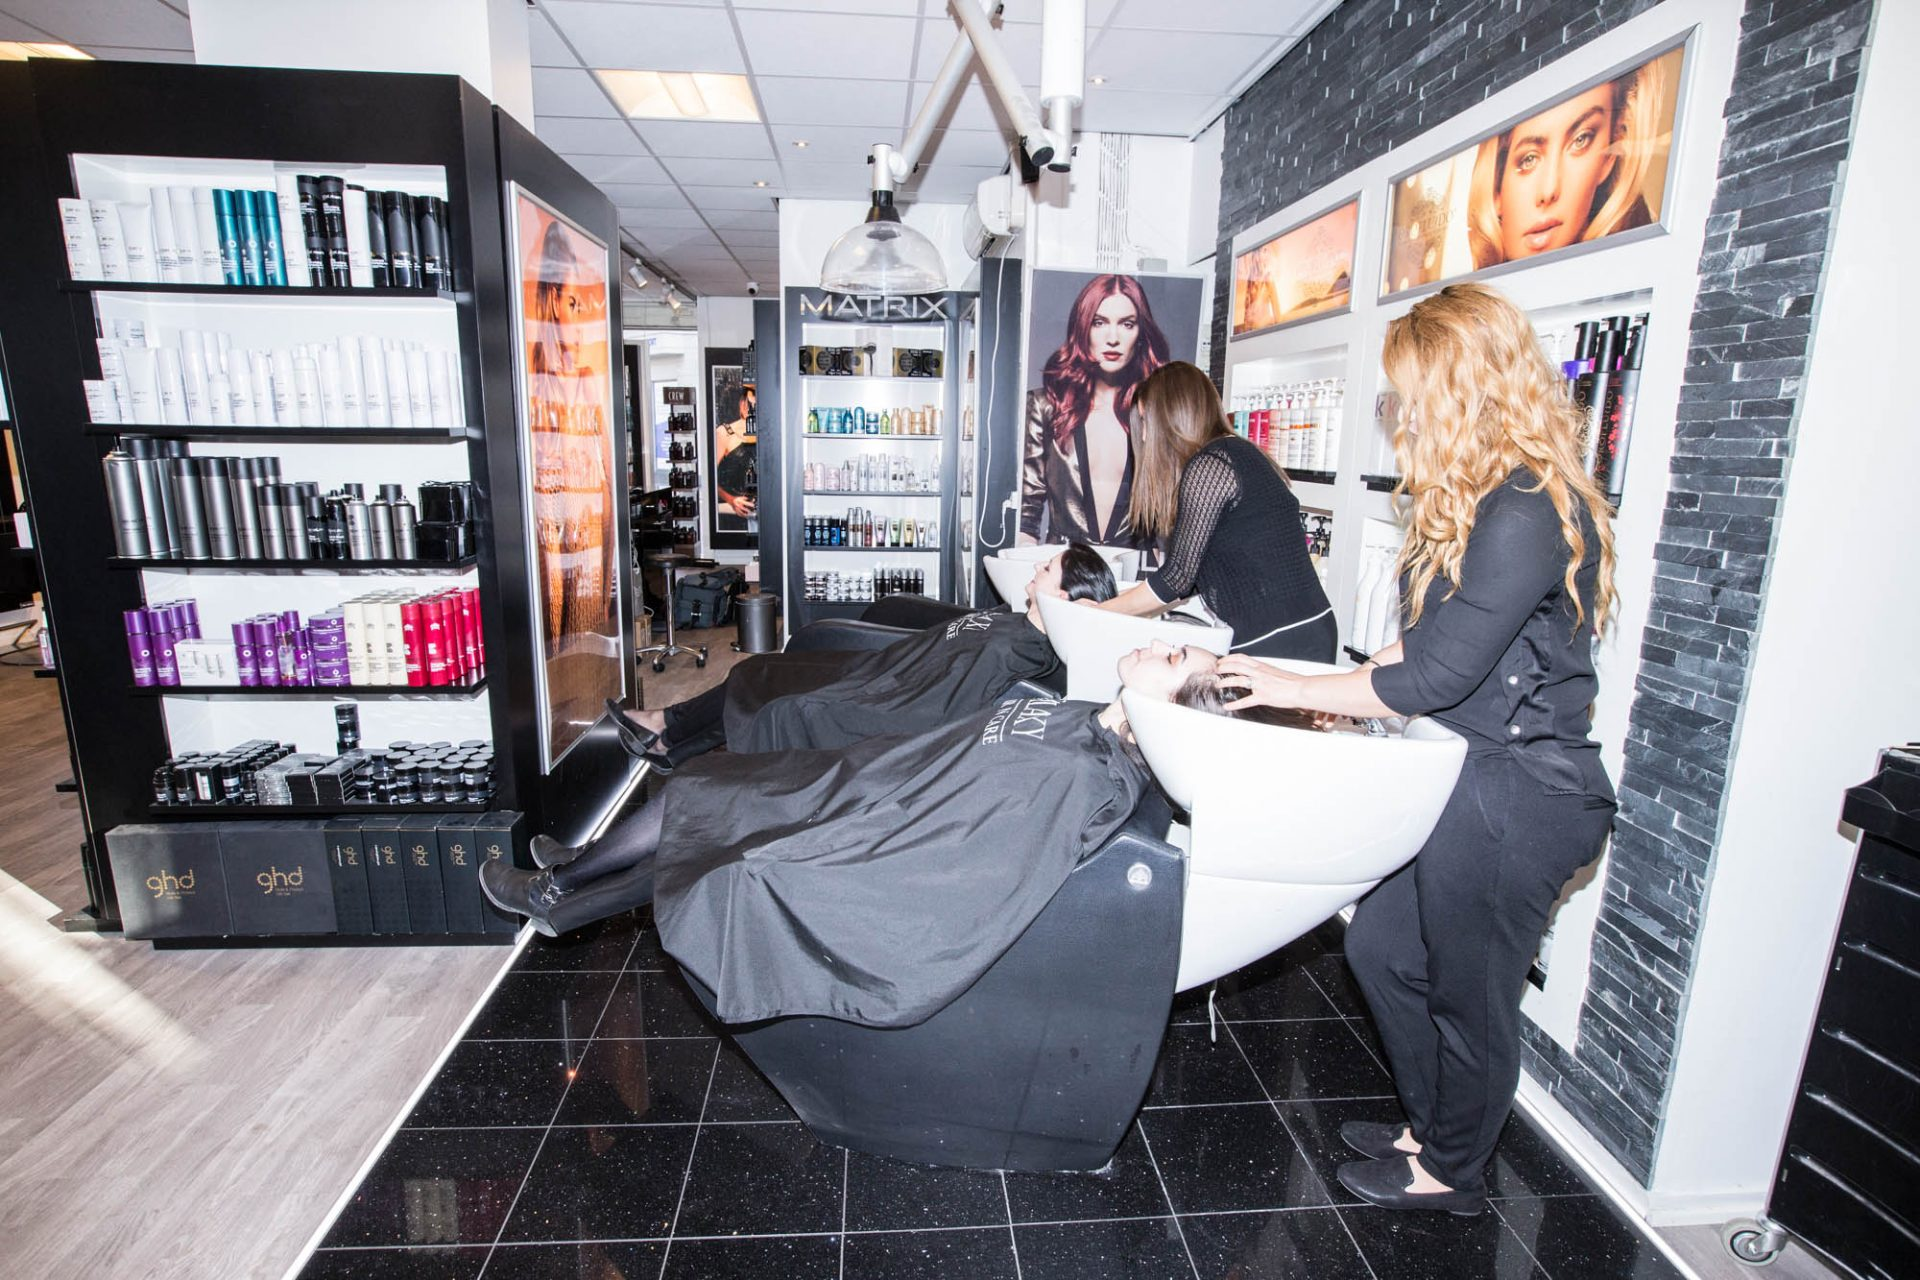 Frisørsalon Valby, Frederiksberg, Hvidovre, kunder får vasket håret